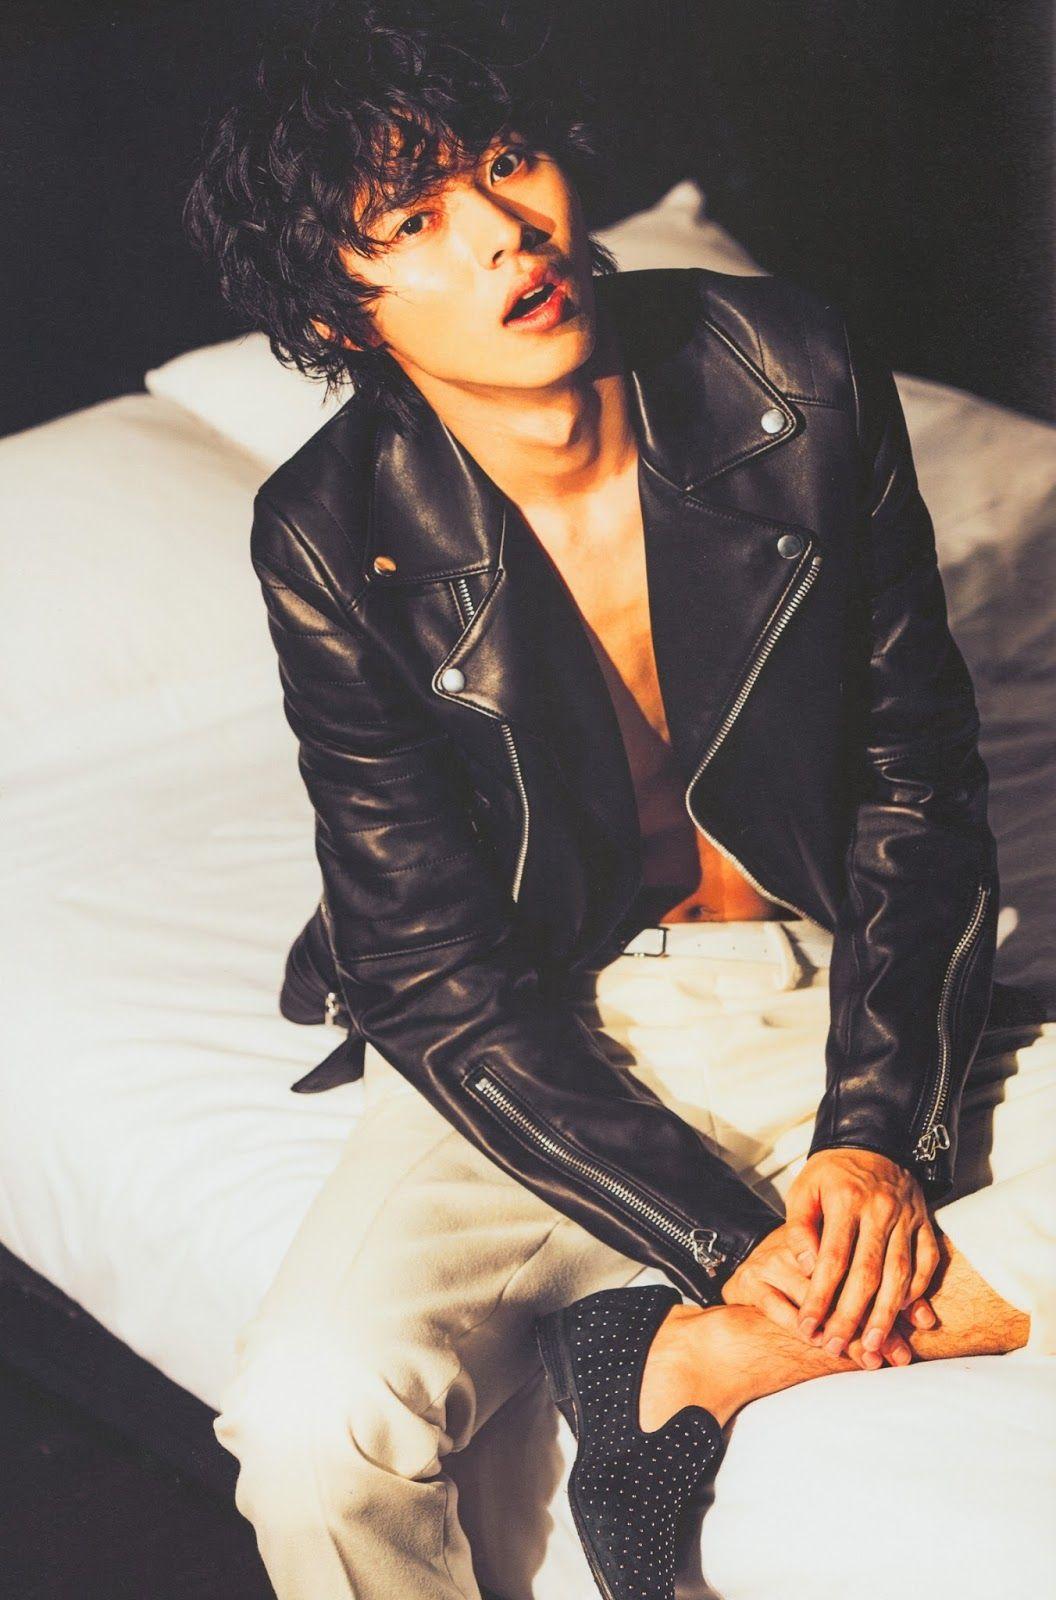 kento yamazaki kento yamazaki yamaken pinterest acteur japonais and japon. Black Bedroom Furniture Sets. Home Design Ideas